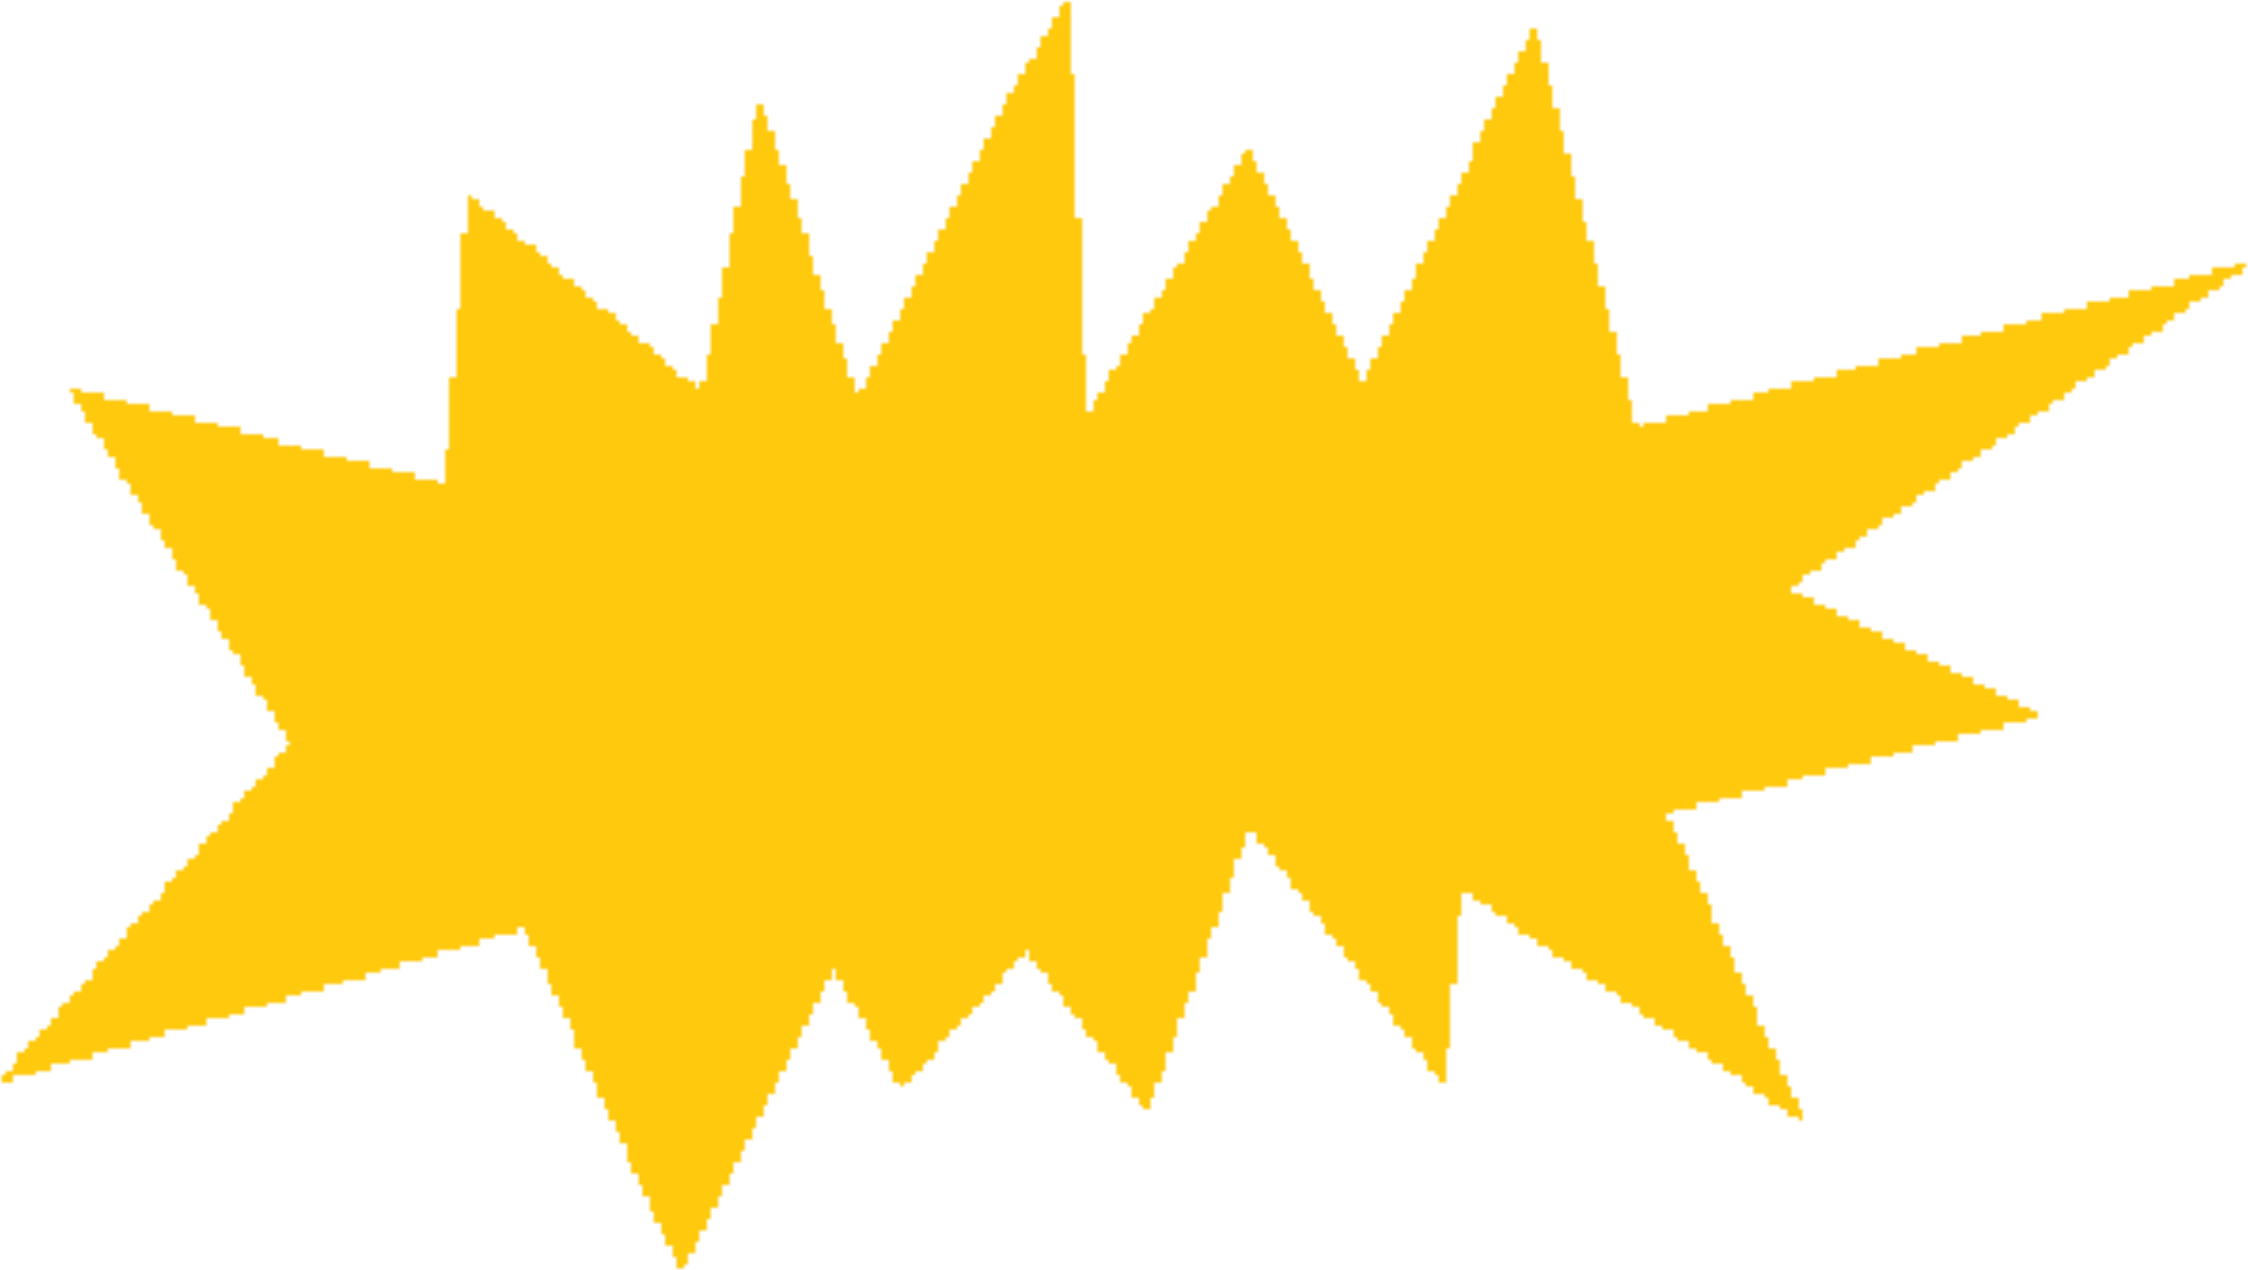 Clipart - Burst